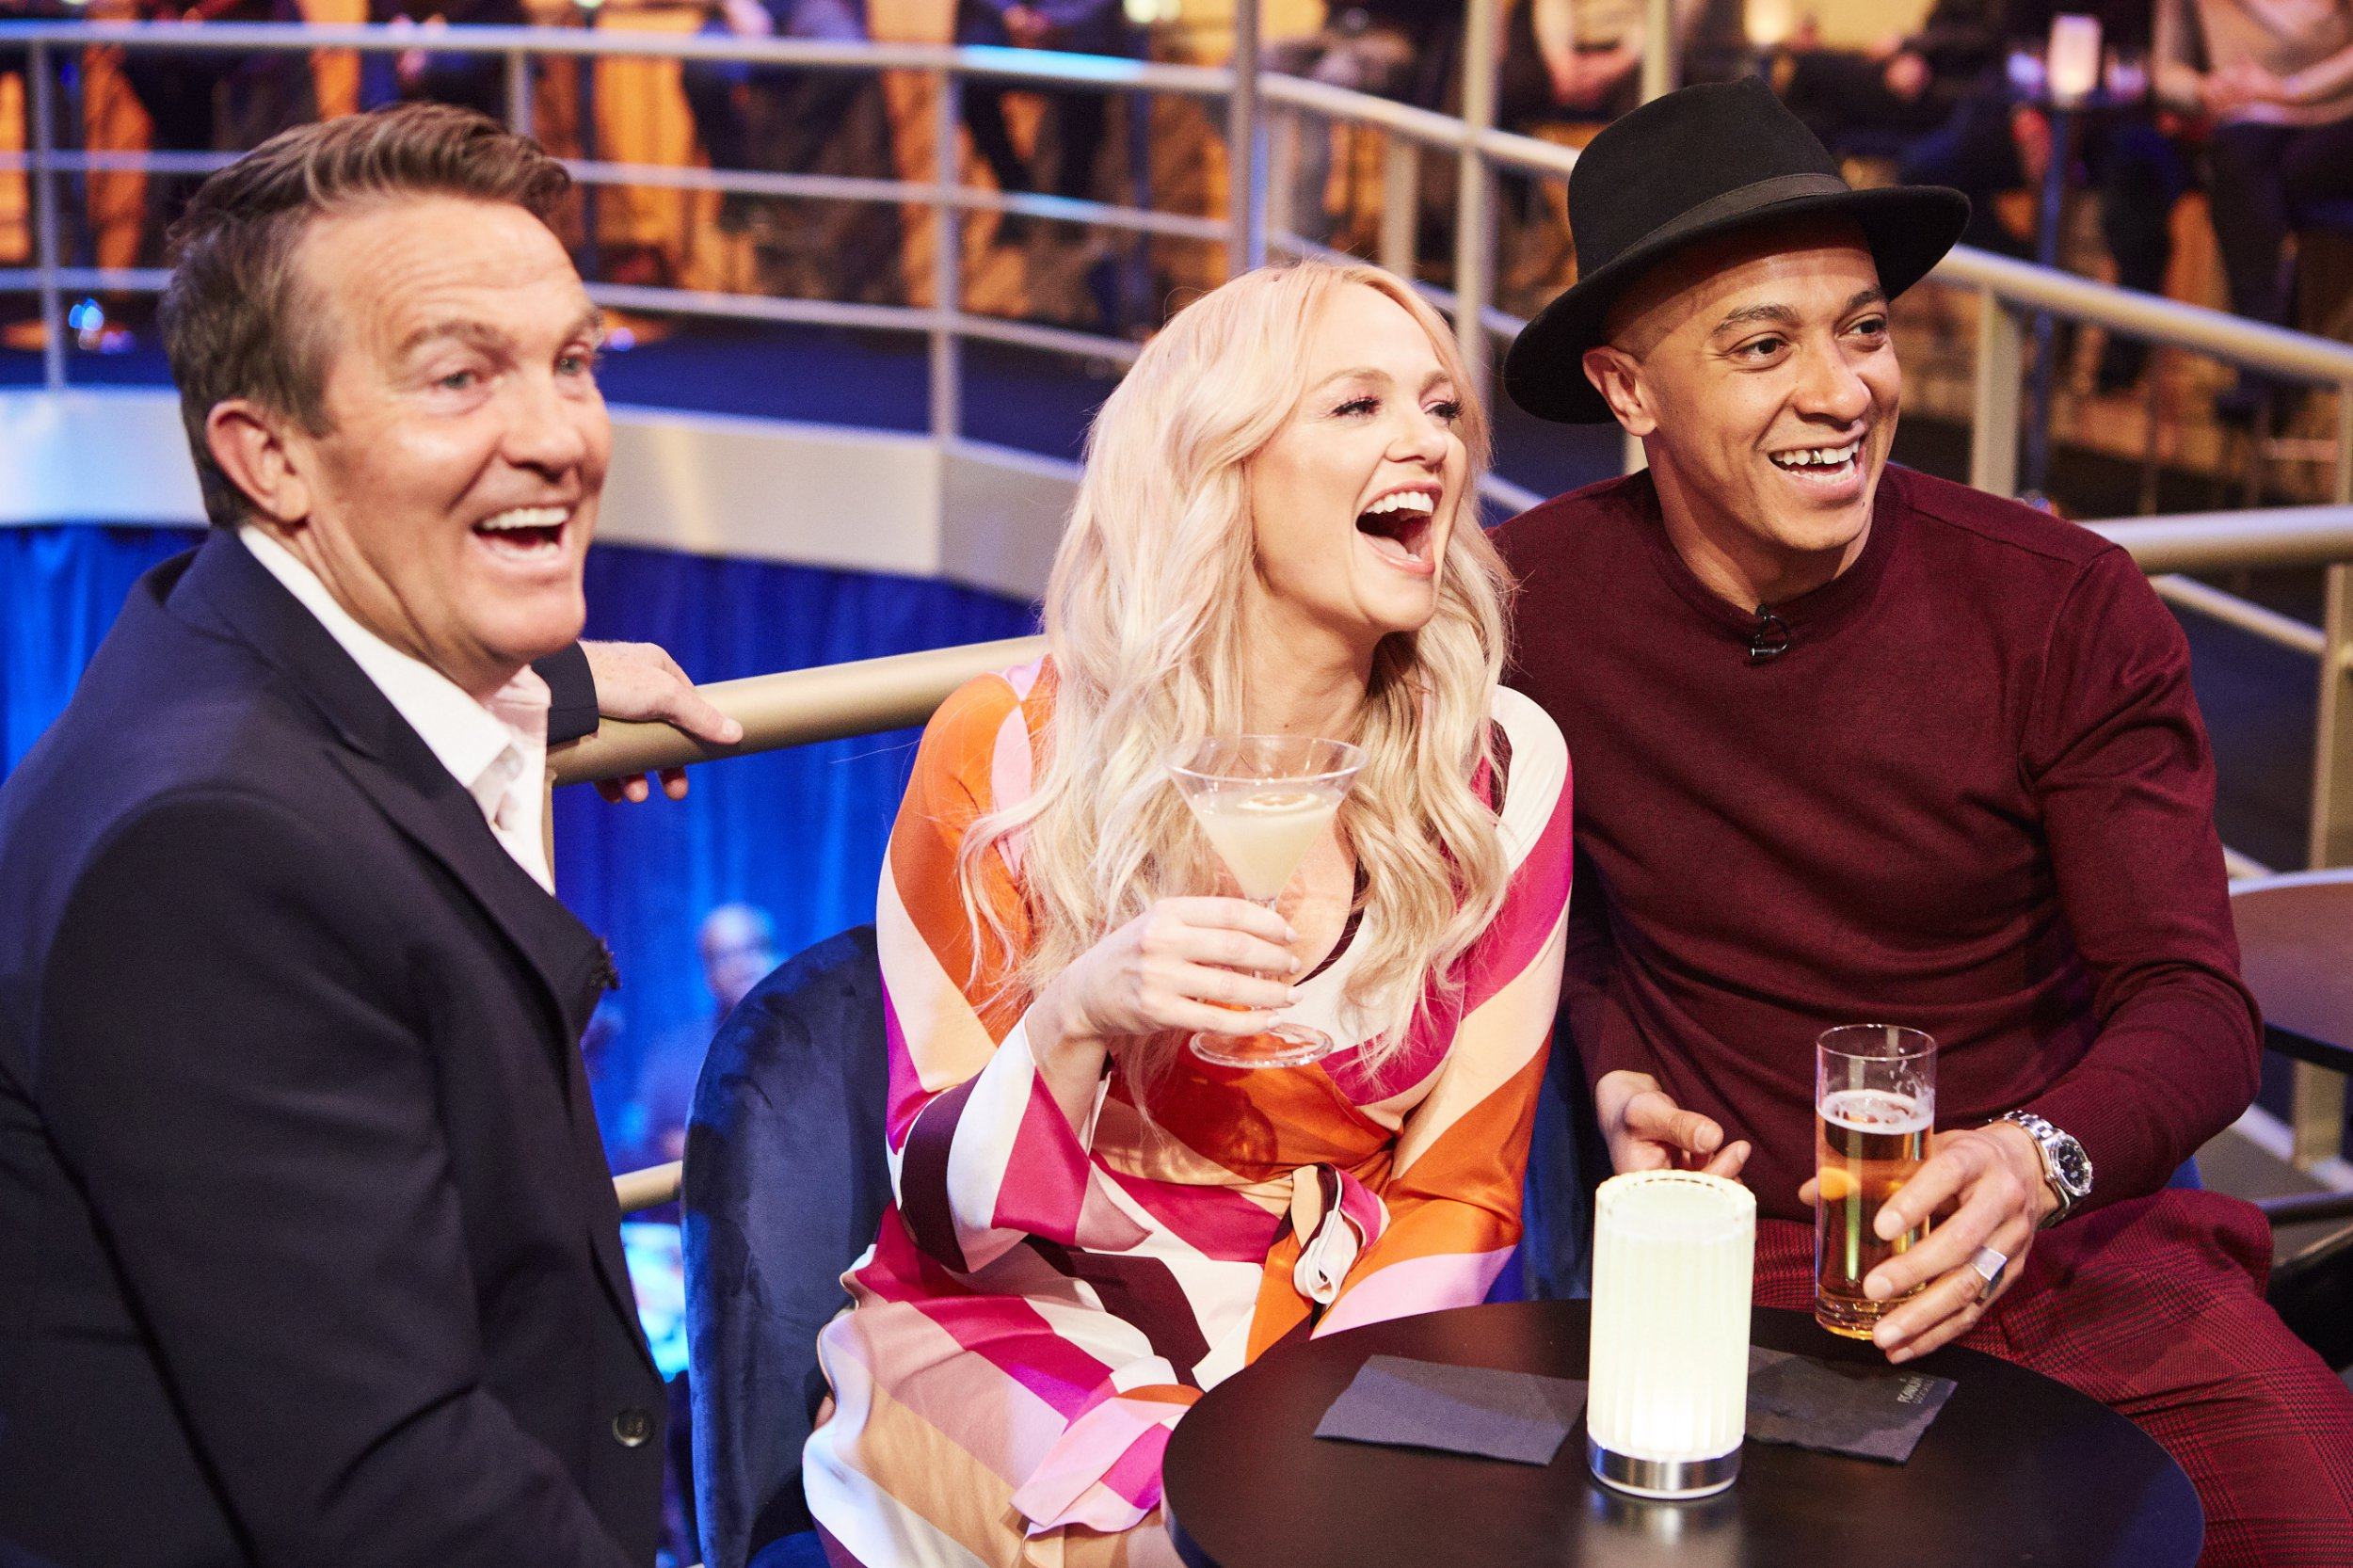 Emma Bunton reveals partner Jade Jones cried during Spice Girls rehearsal as she teases 'nostalgic' tour